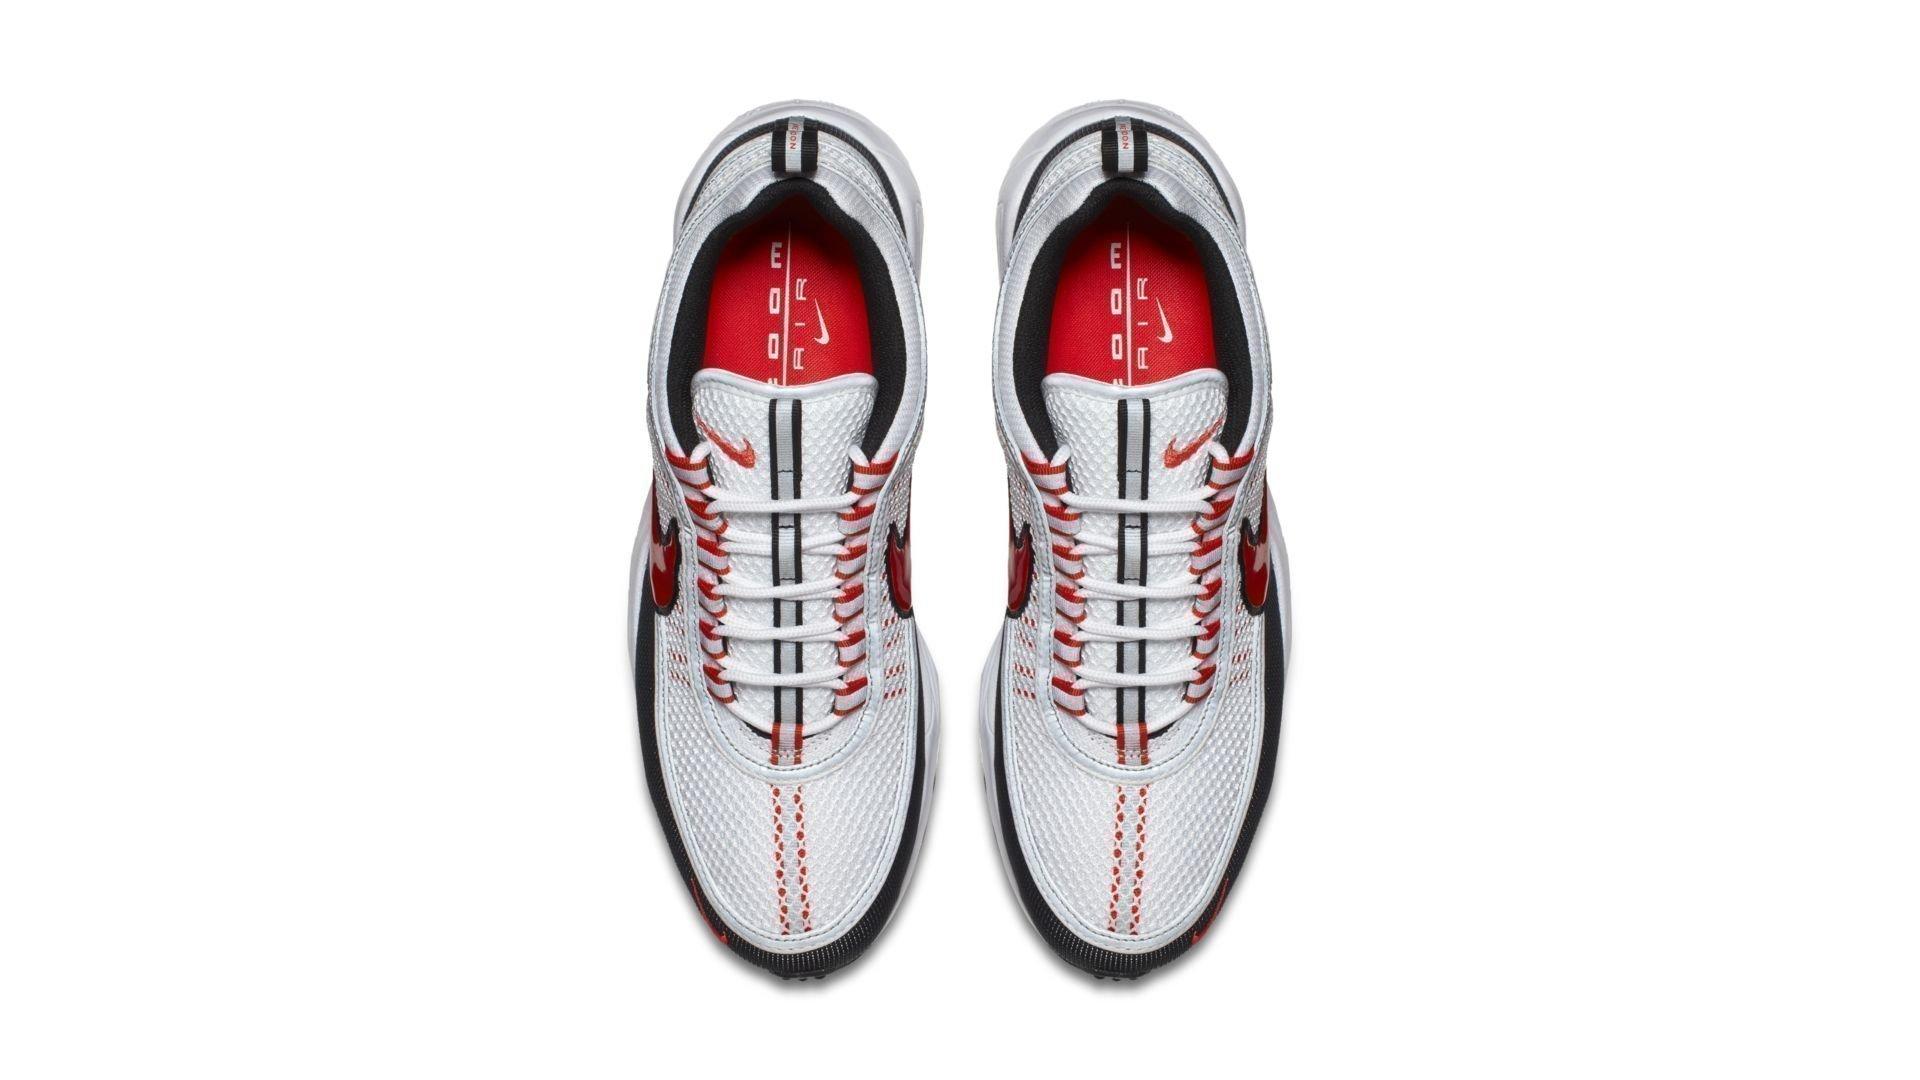 Nike Air Zoom Spiridon Team Orange (926955-106)